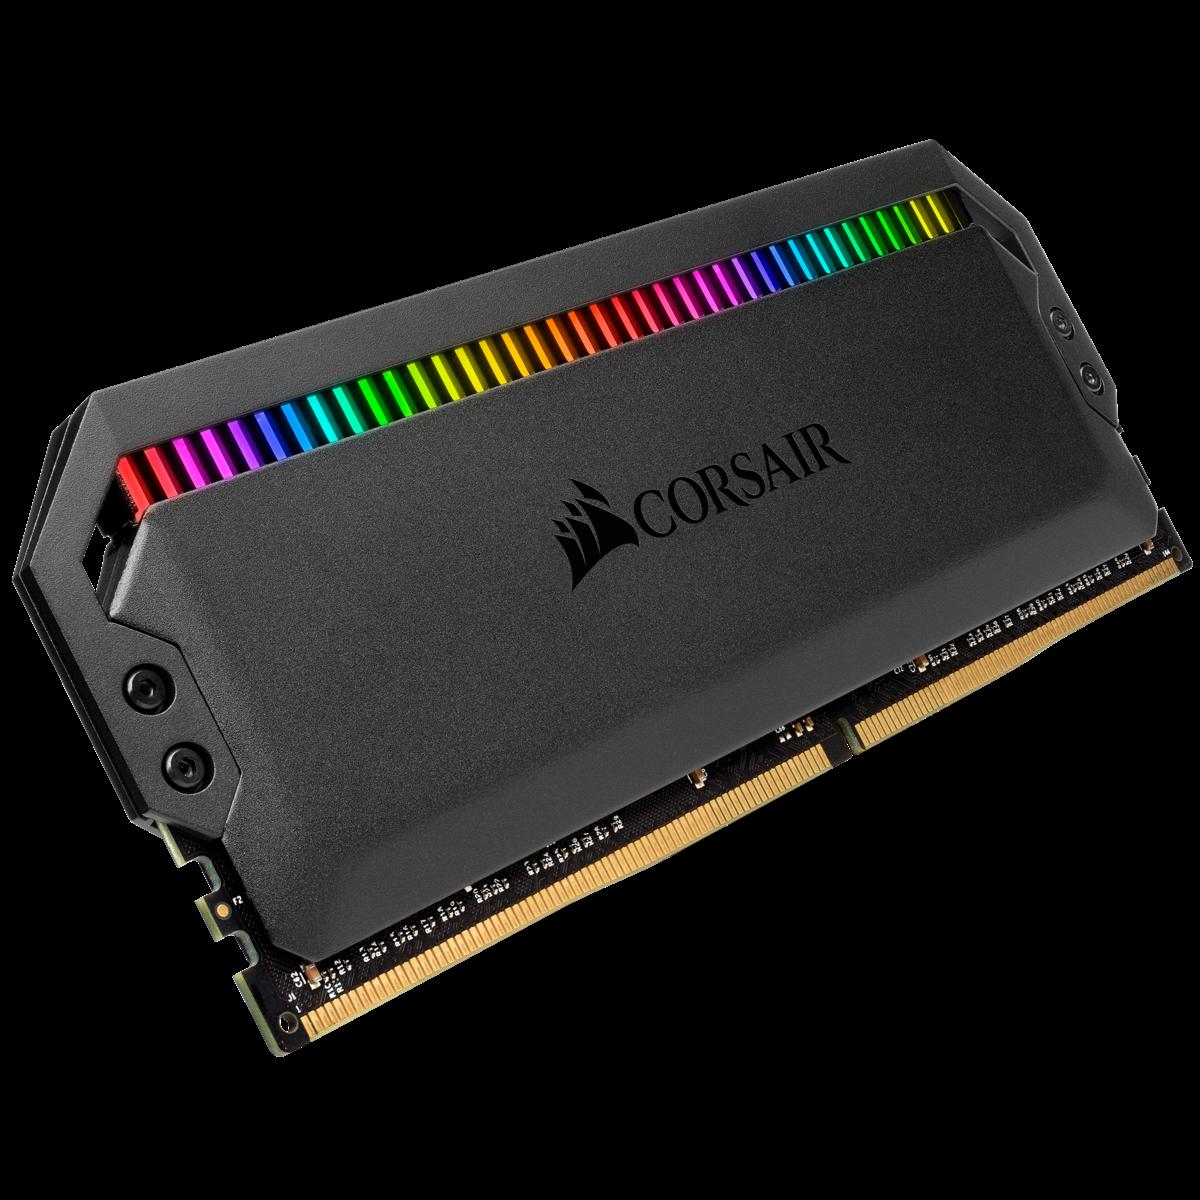 (16G DDR4 2x8G 3000 ) Corsair Dominator Platinum RGB